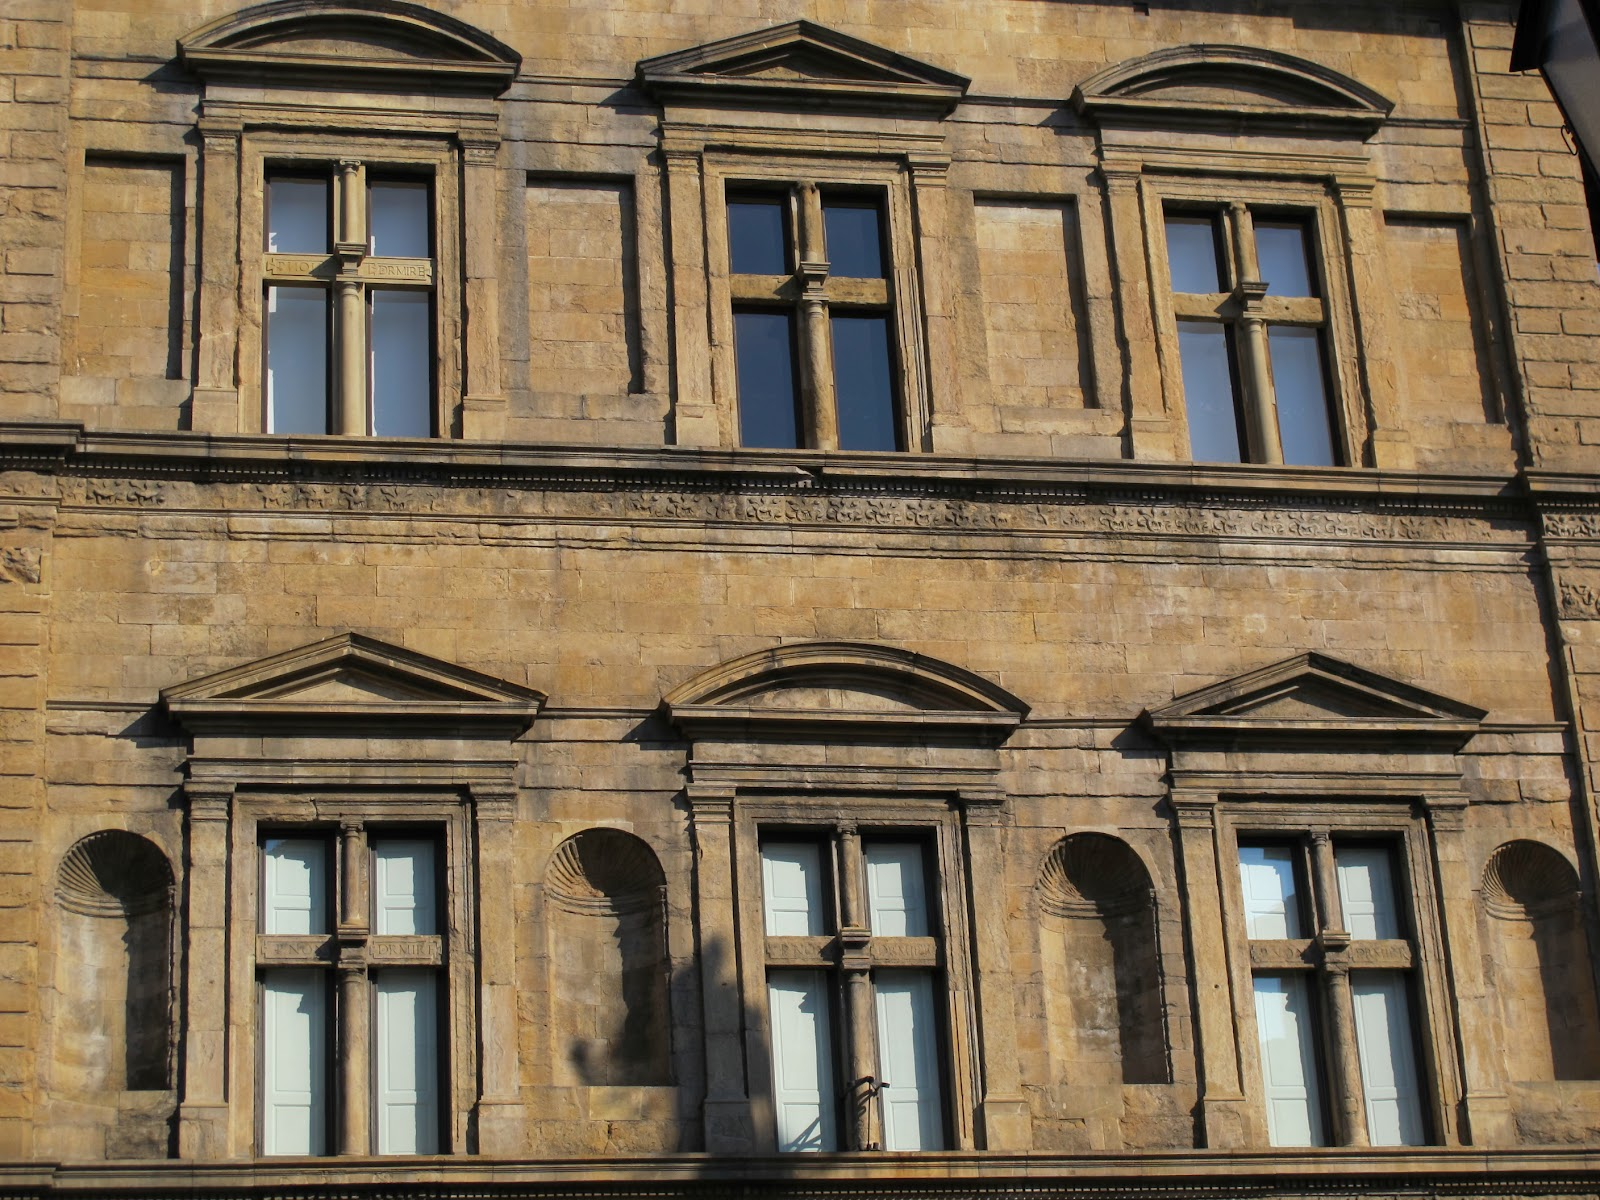 Palazzo_bartolini_salimbeni,_finestr2[1]